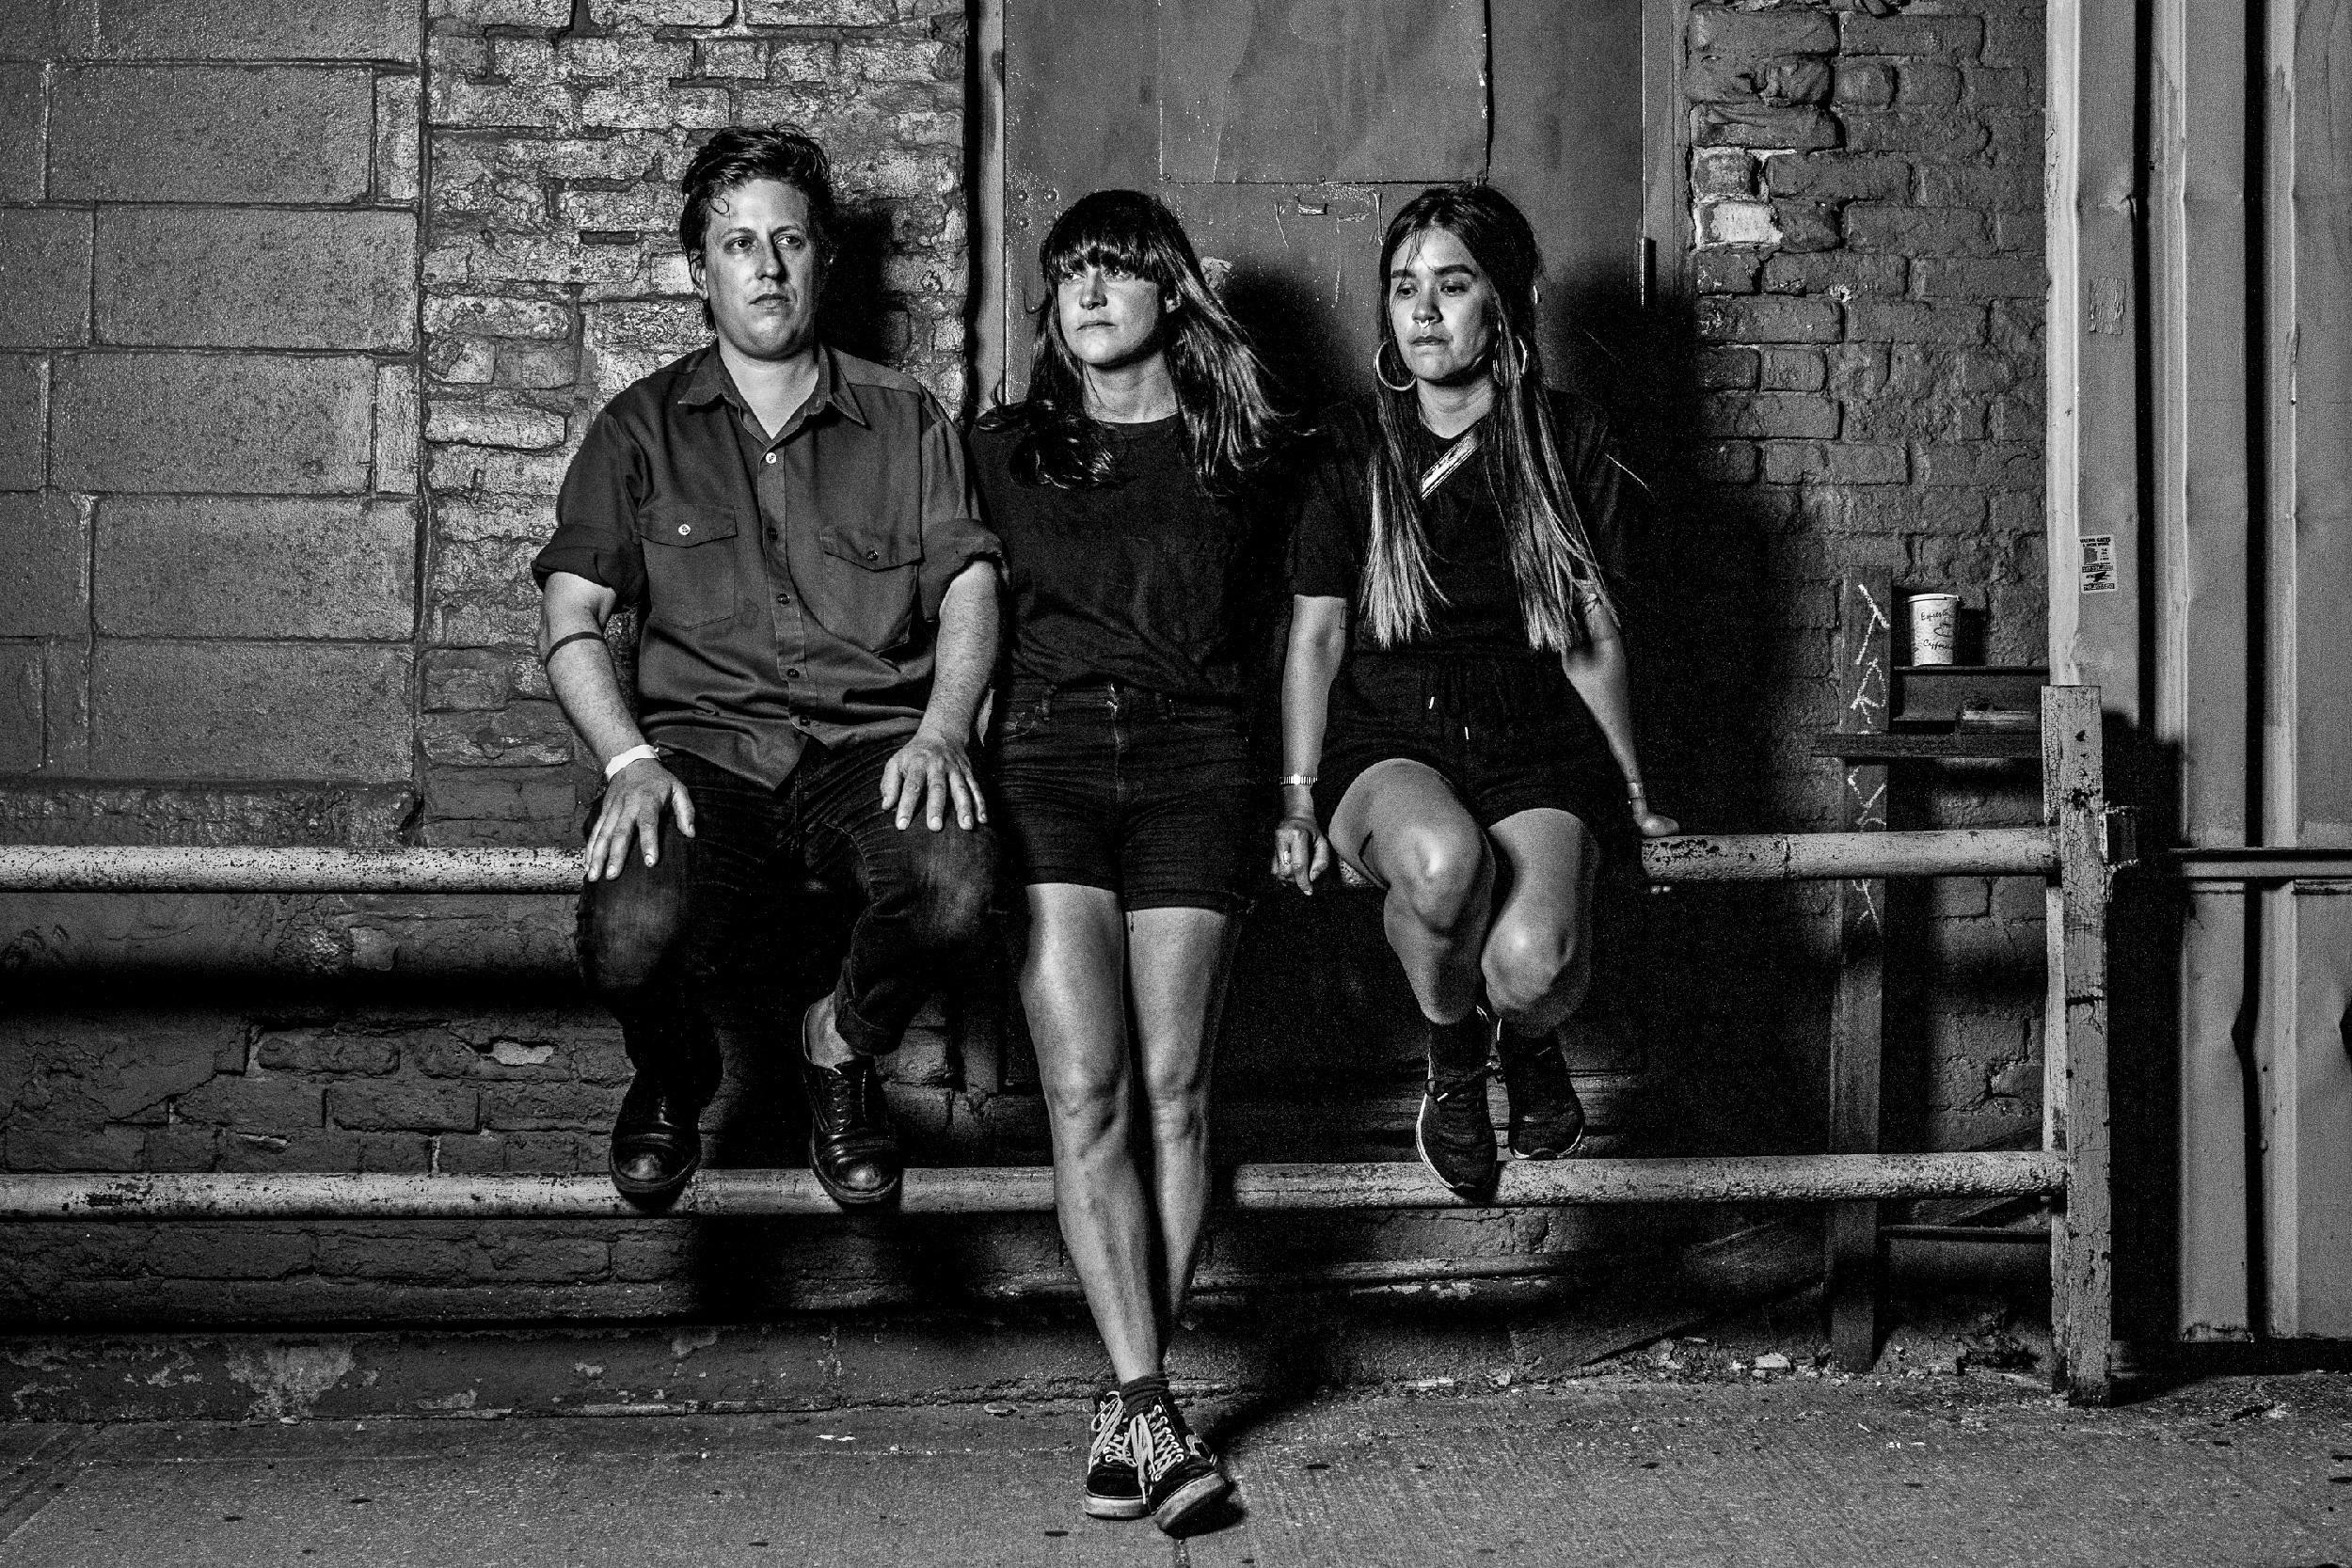 Mathieu, Tasreen and Robin.